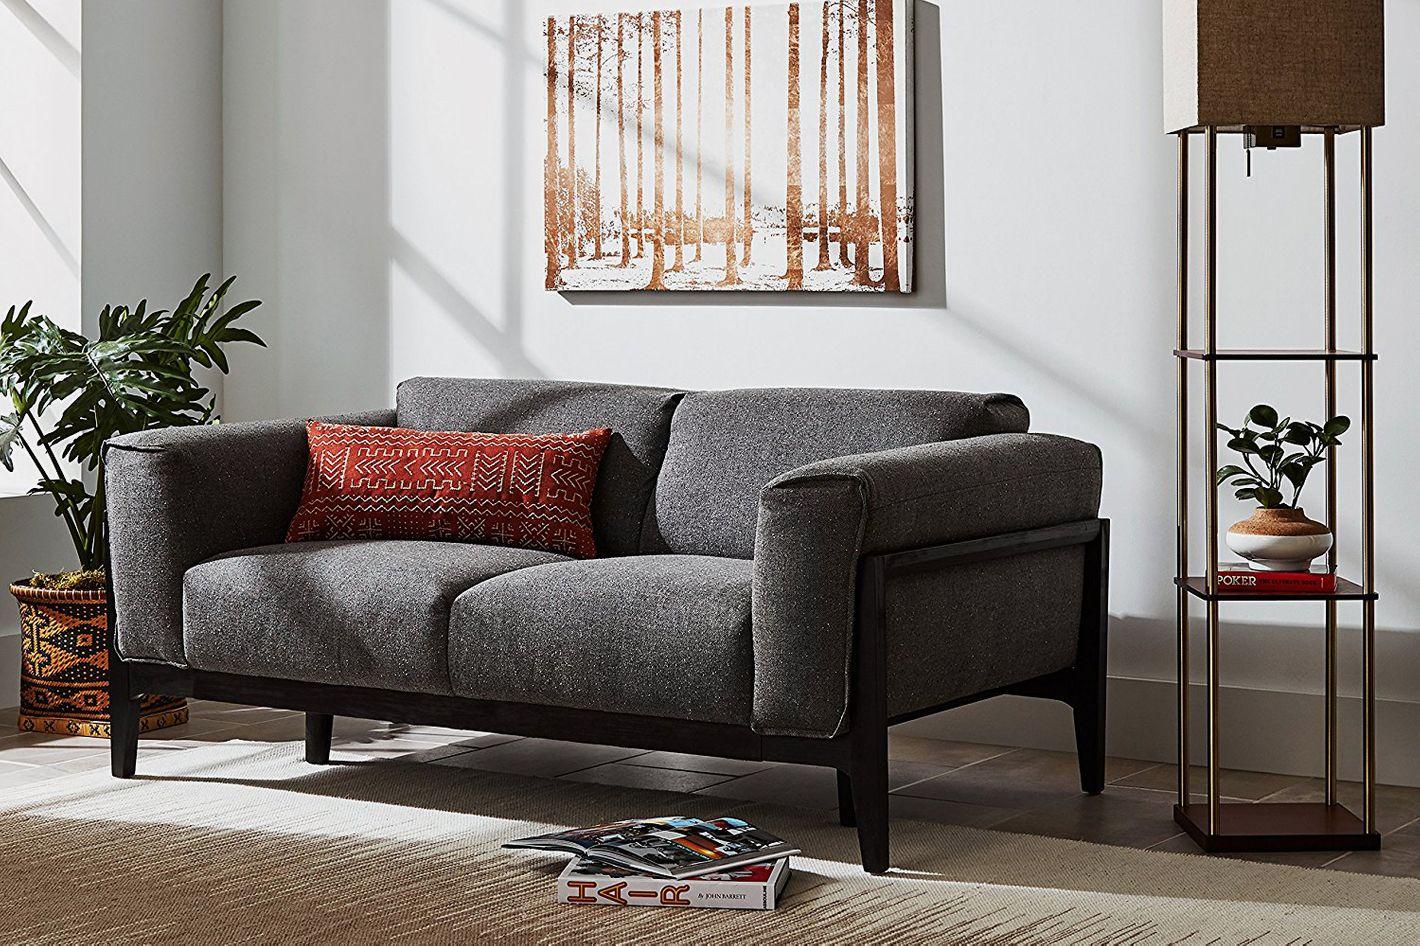 Rivet Apex Oversized Cushion Modern Sofa